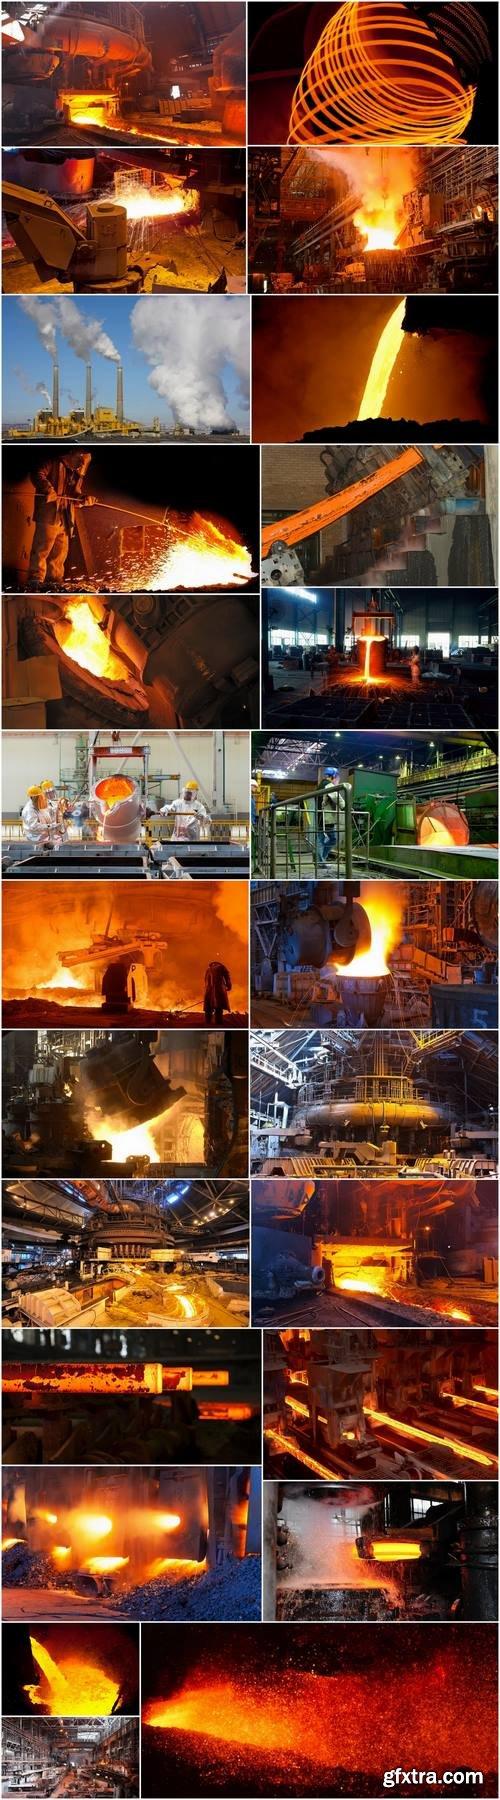 Metallurgical plant metal rolling molten metal steel raw materials ore 25 HQ Jpeg